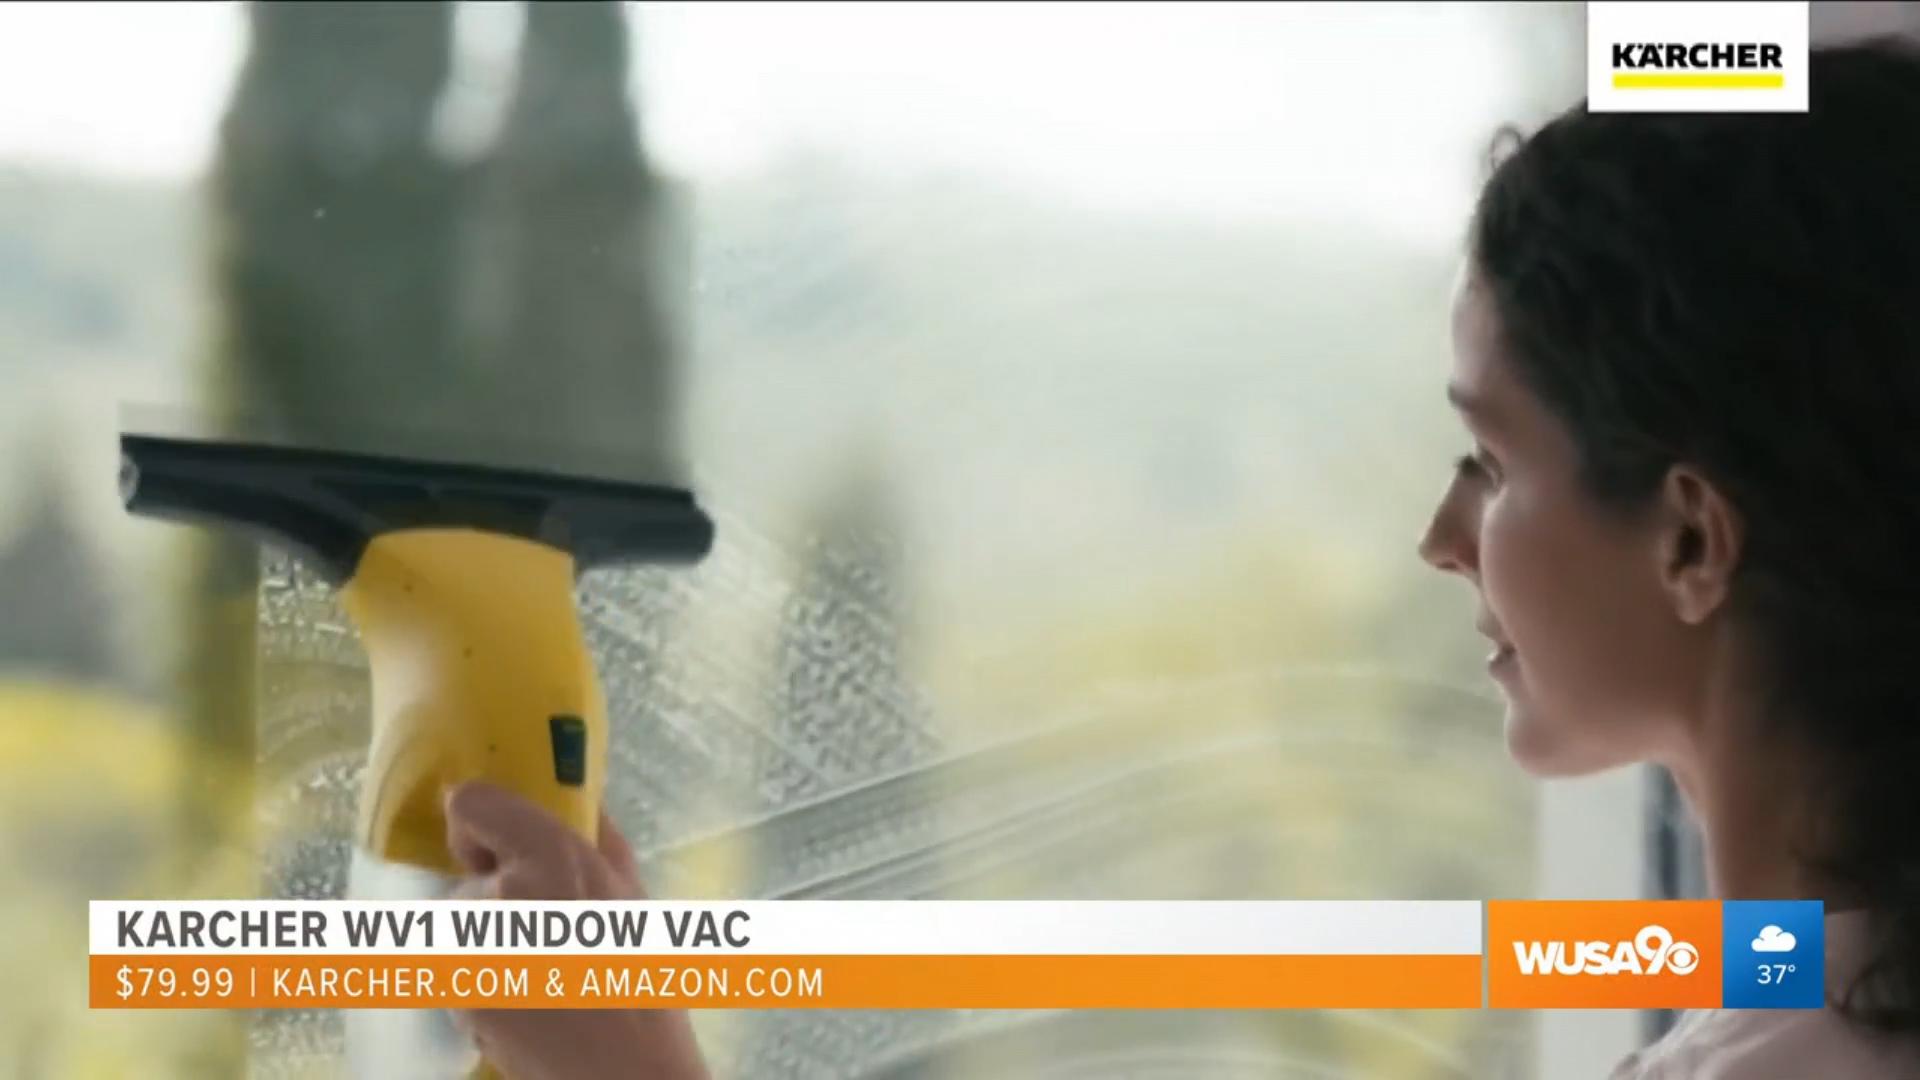 KARCHER WV1 WINDOW VAC - $79.99 at Karcher.com or Amazon.comShop Now